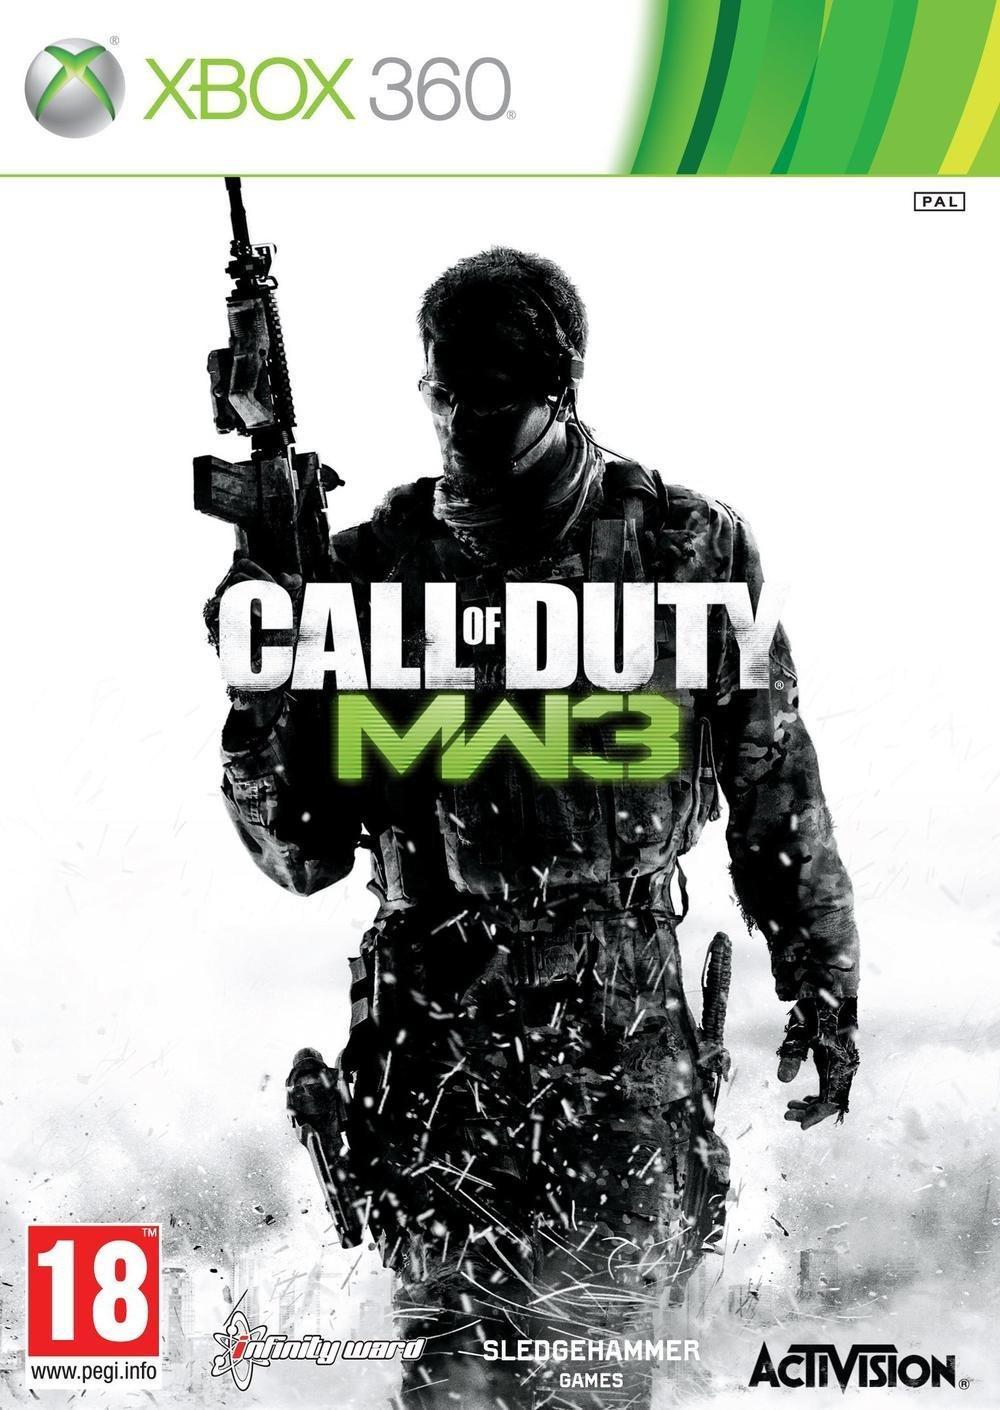 Call of Duty - Modern Warfare 3 sur Xbox 360